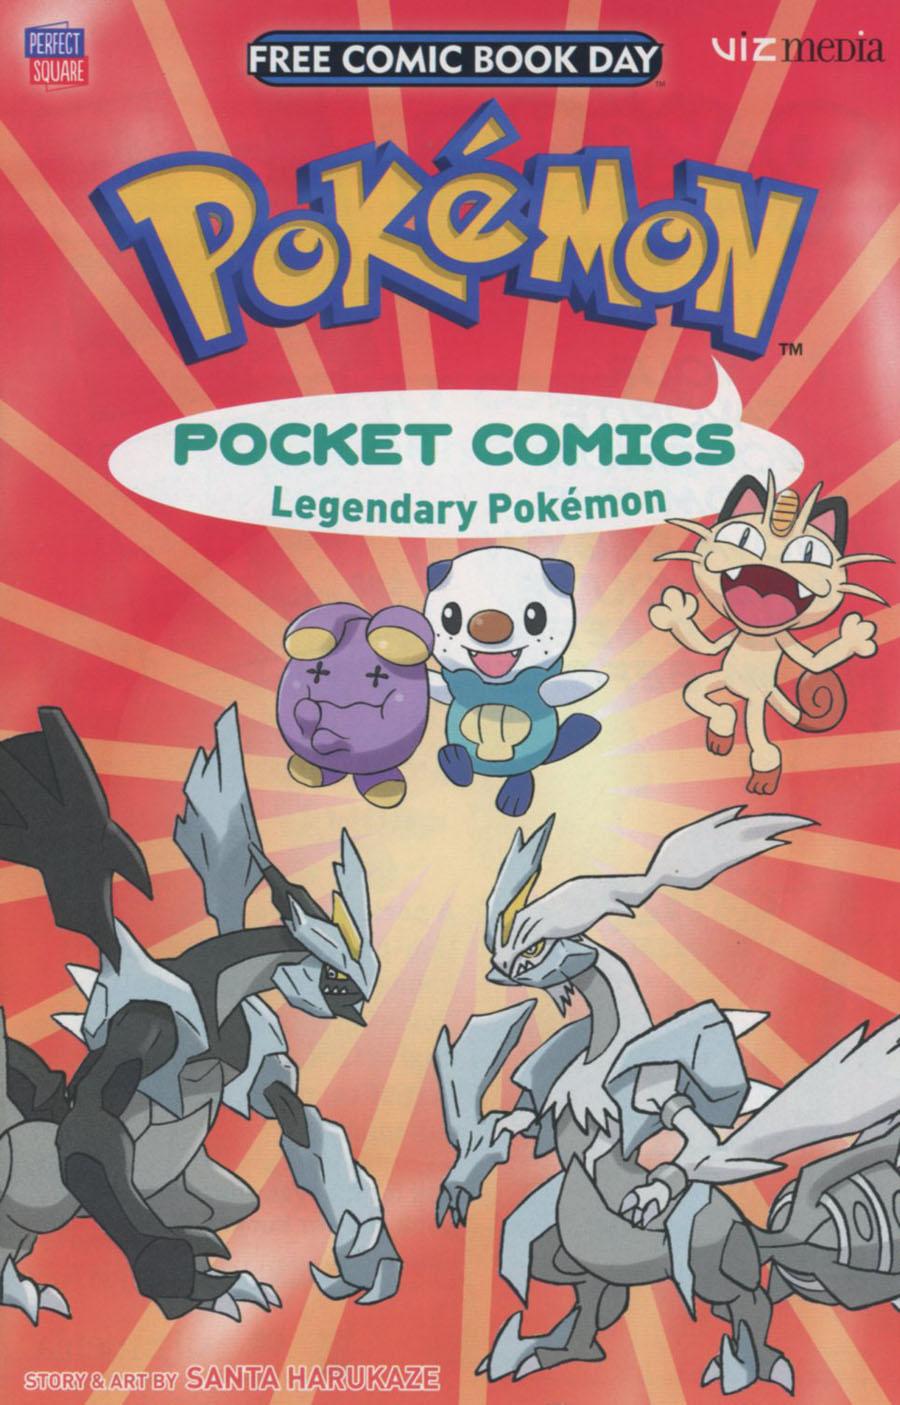 Perfect Square Presents Pokemon Pocket Comics FCBD 2016